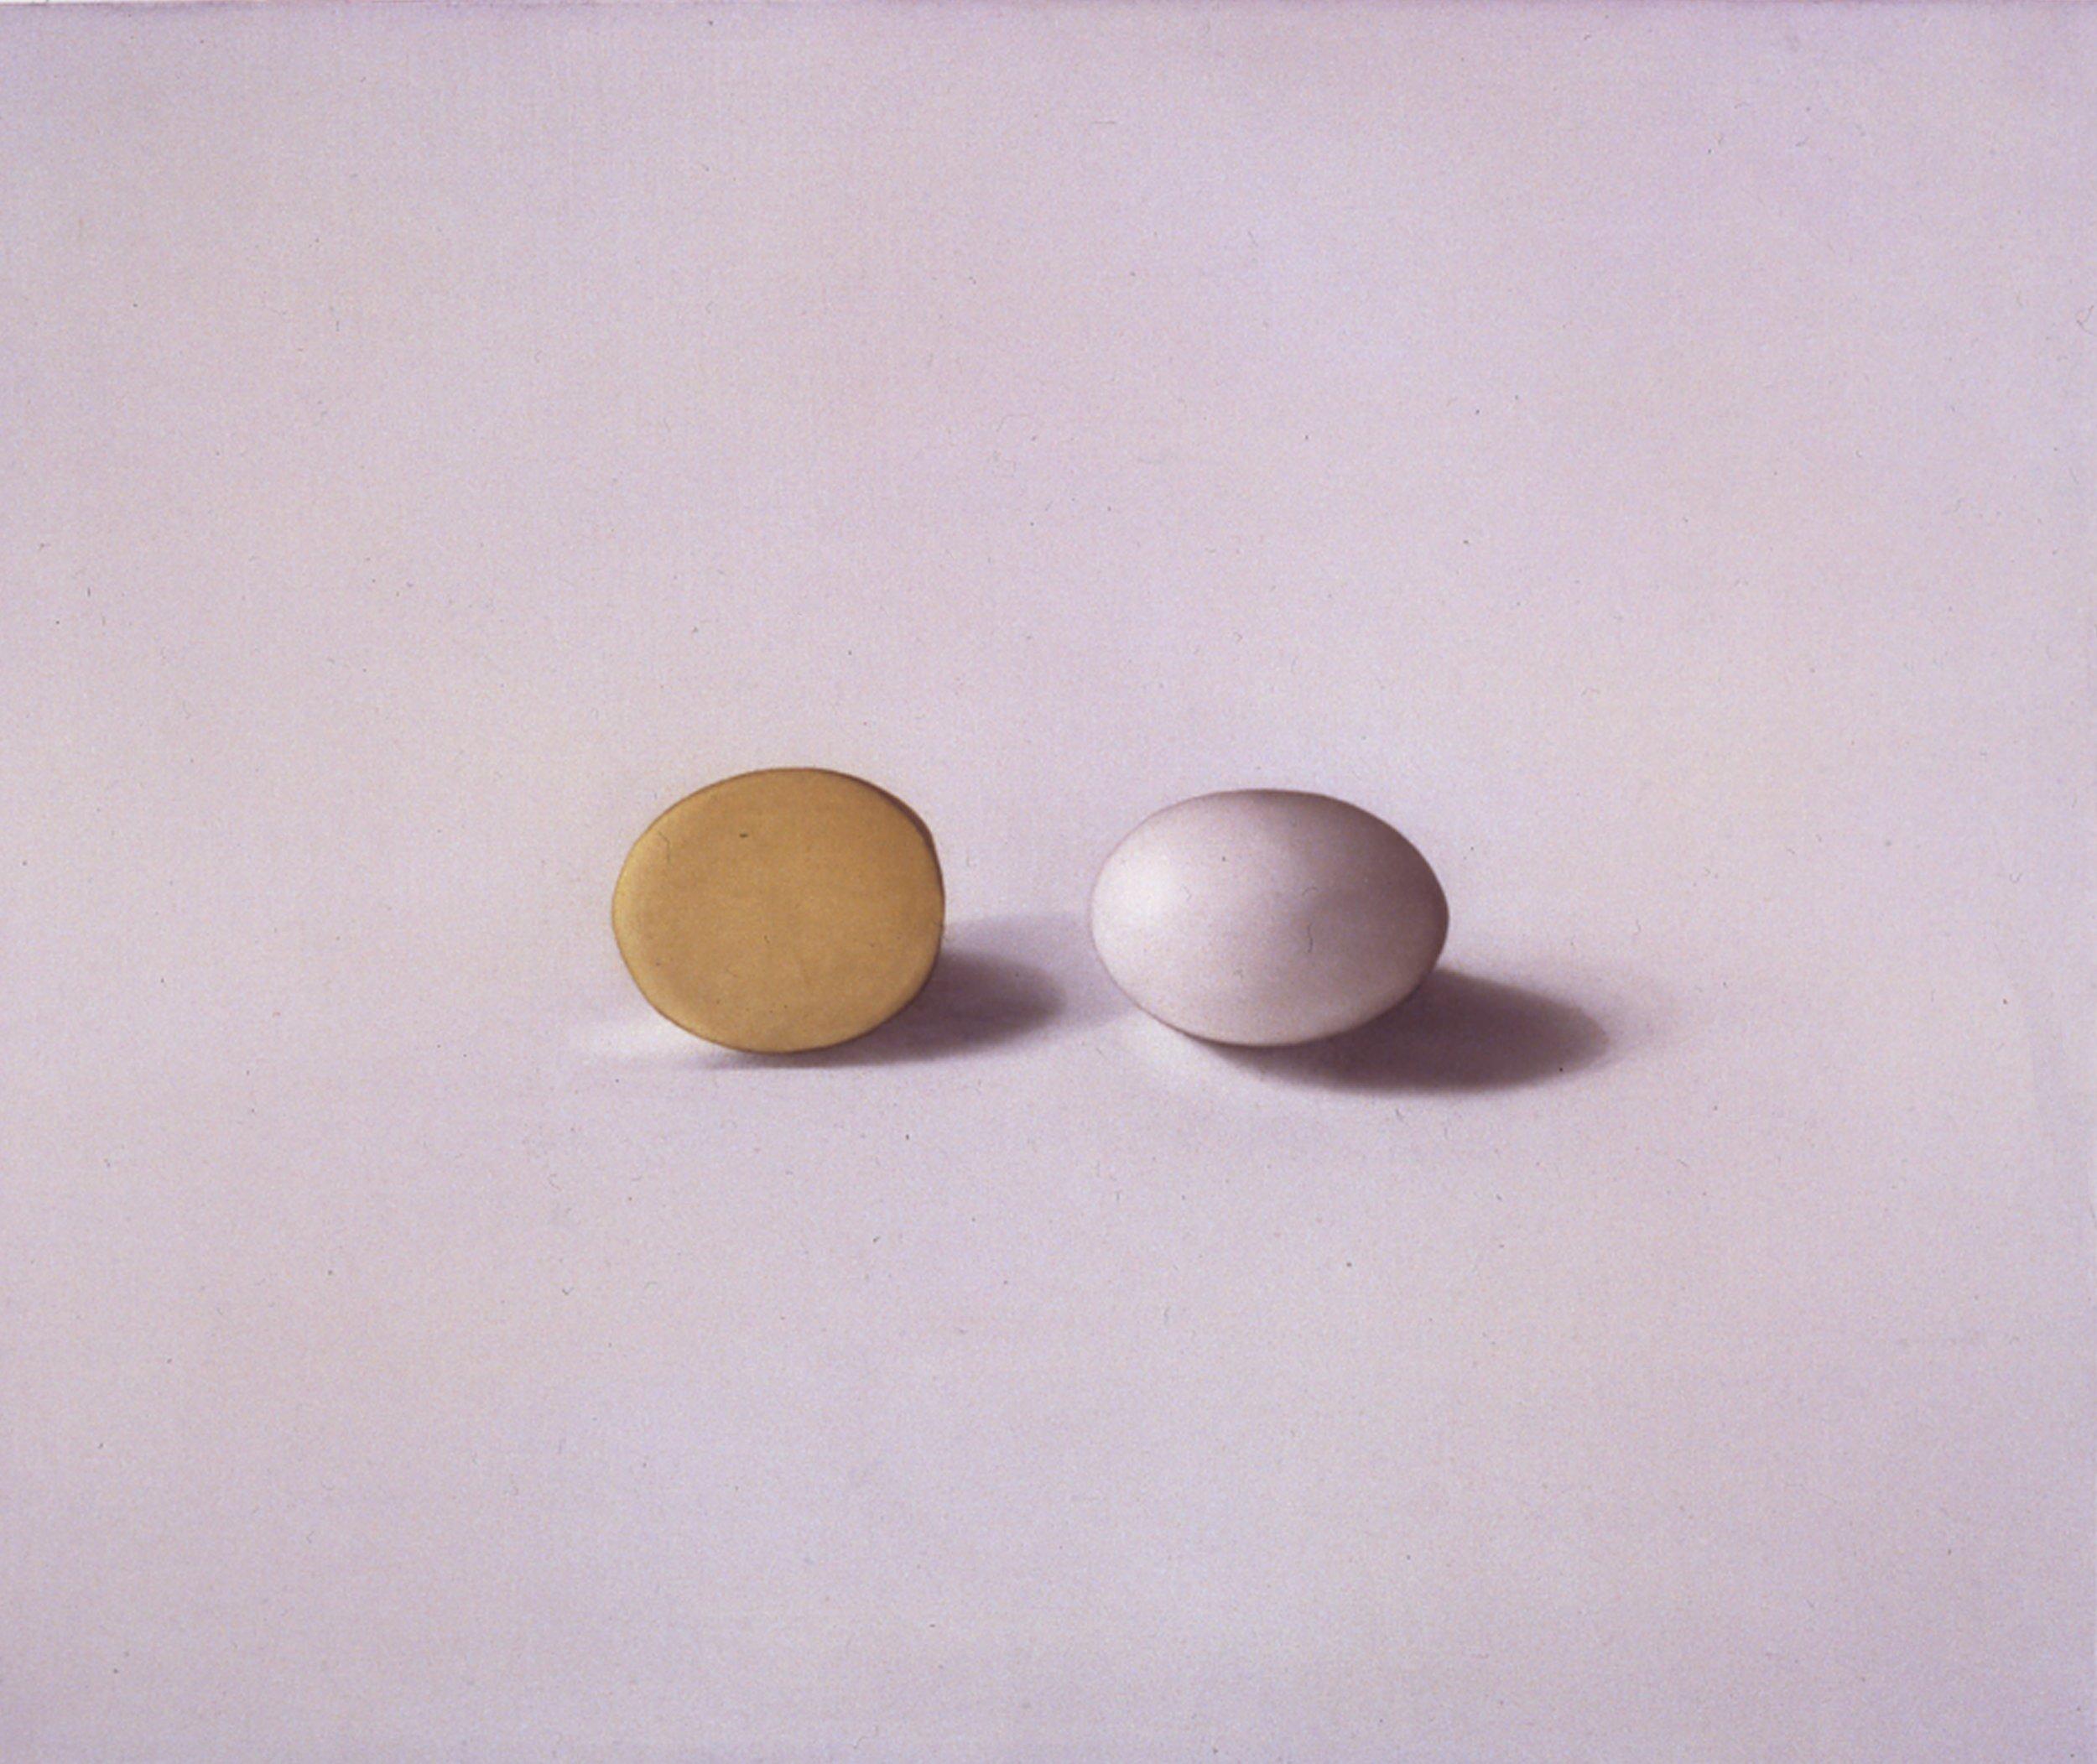 Egg and Potato, 1997, 15x18, o/l